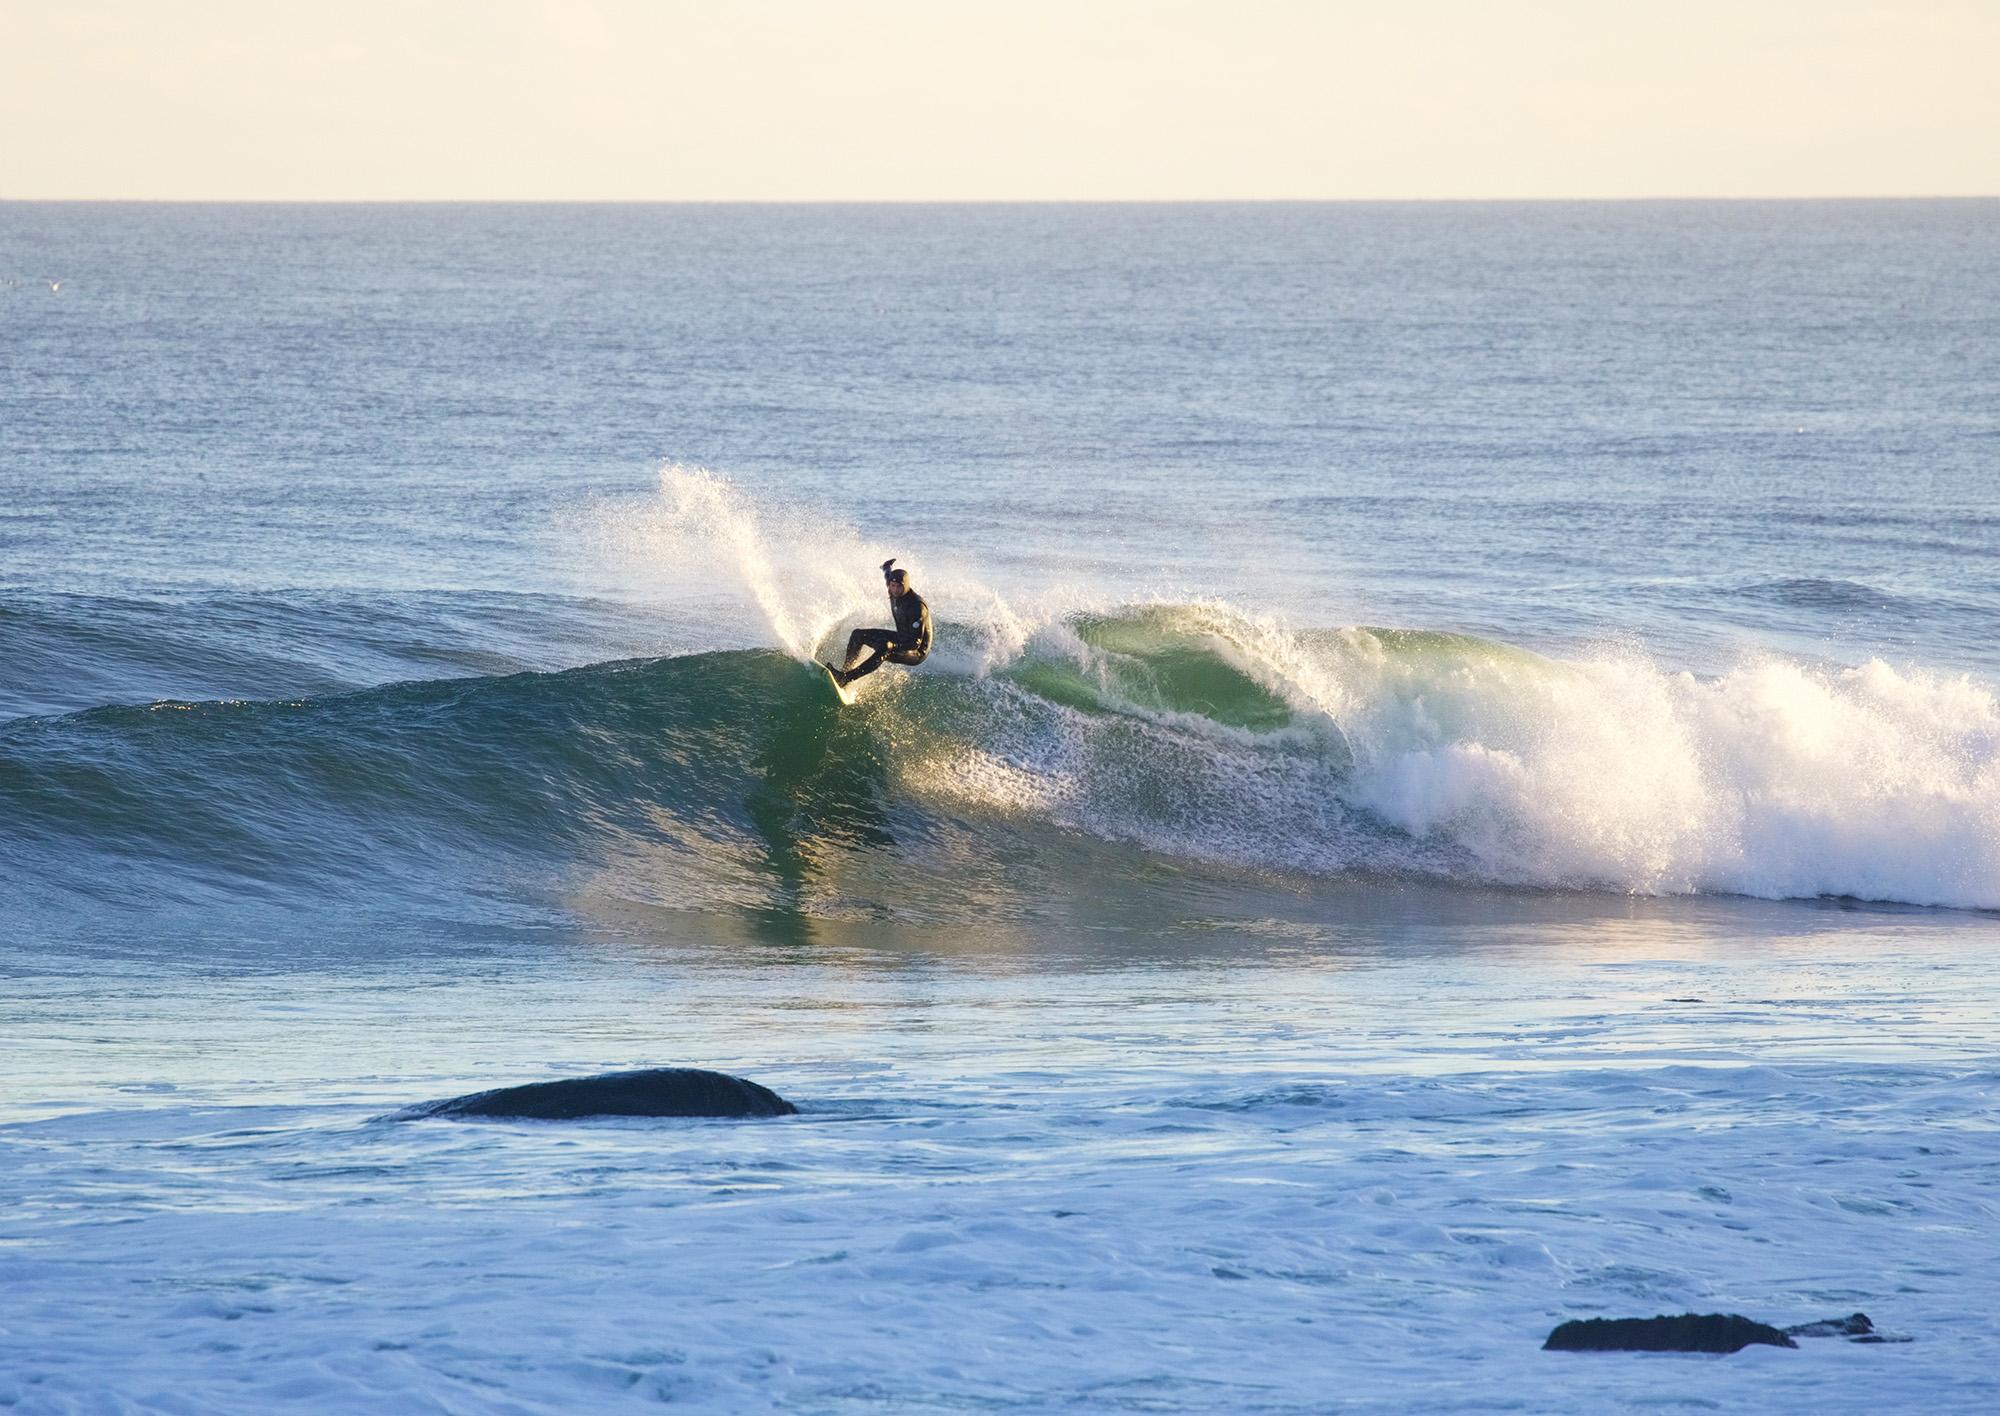 1-19-17 MTK Surfer 12.jpg